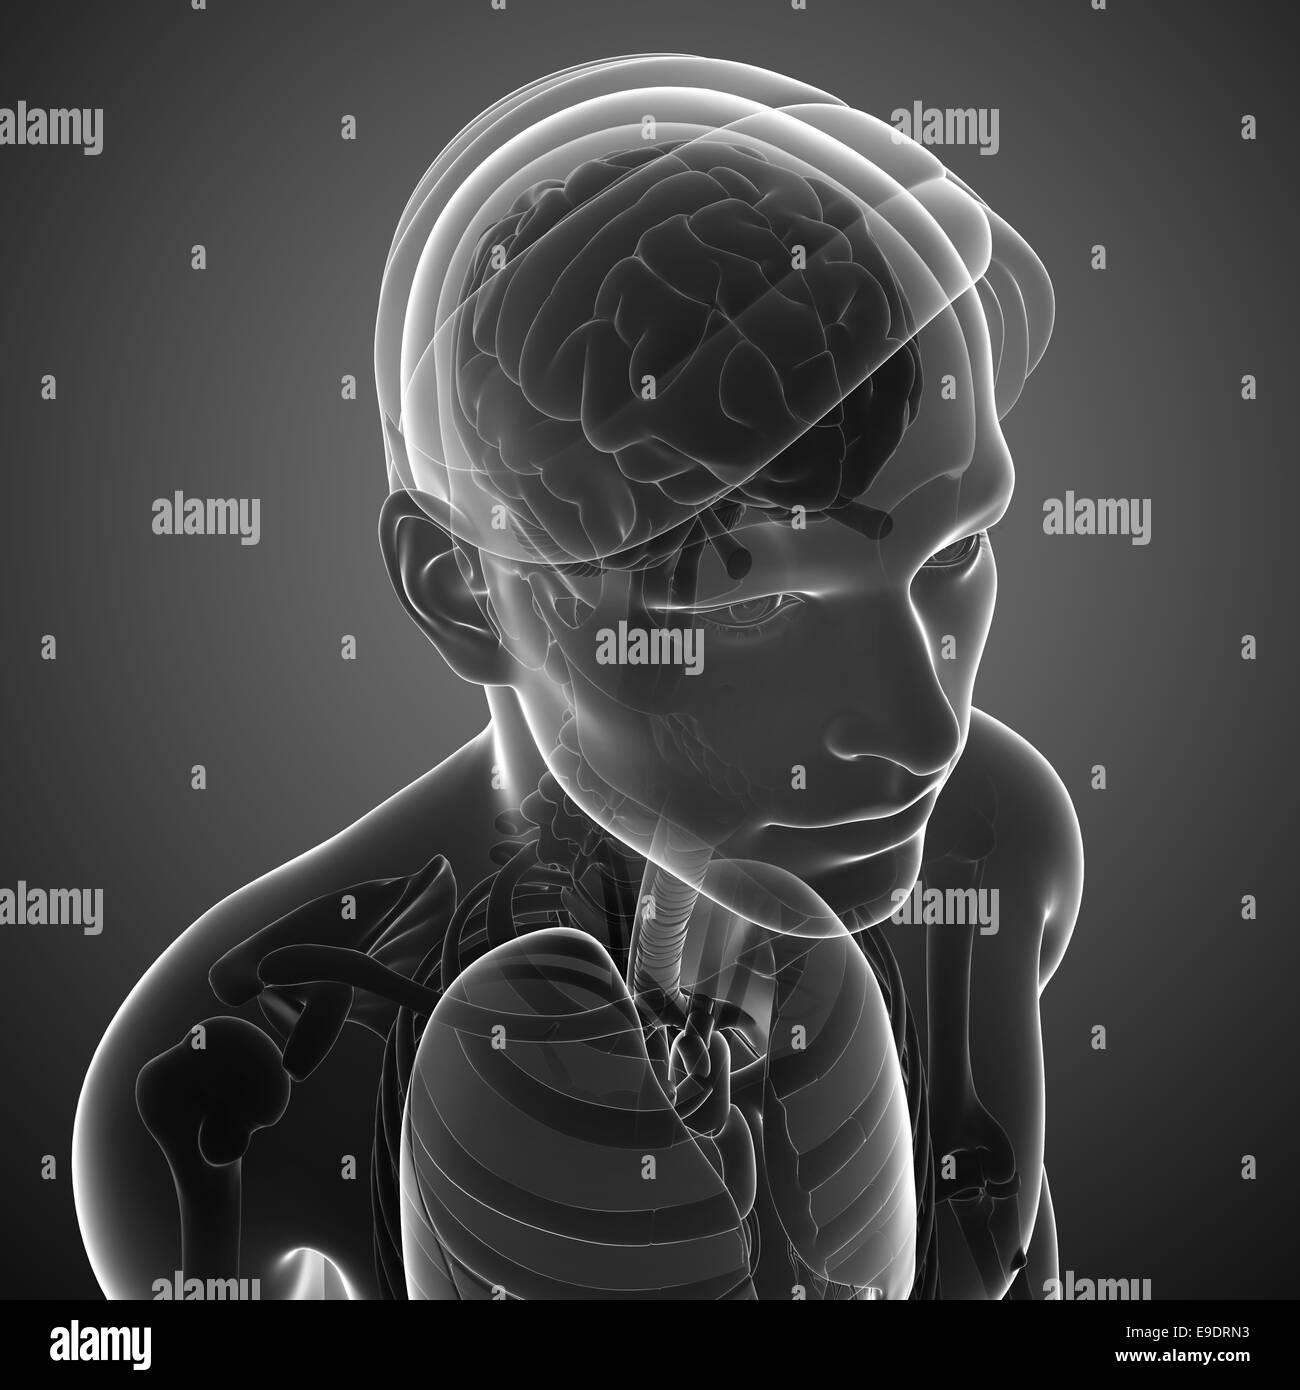 Illustration of male x ray brain anatomy artwork Stock Photo ...